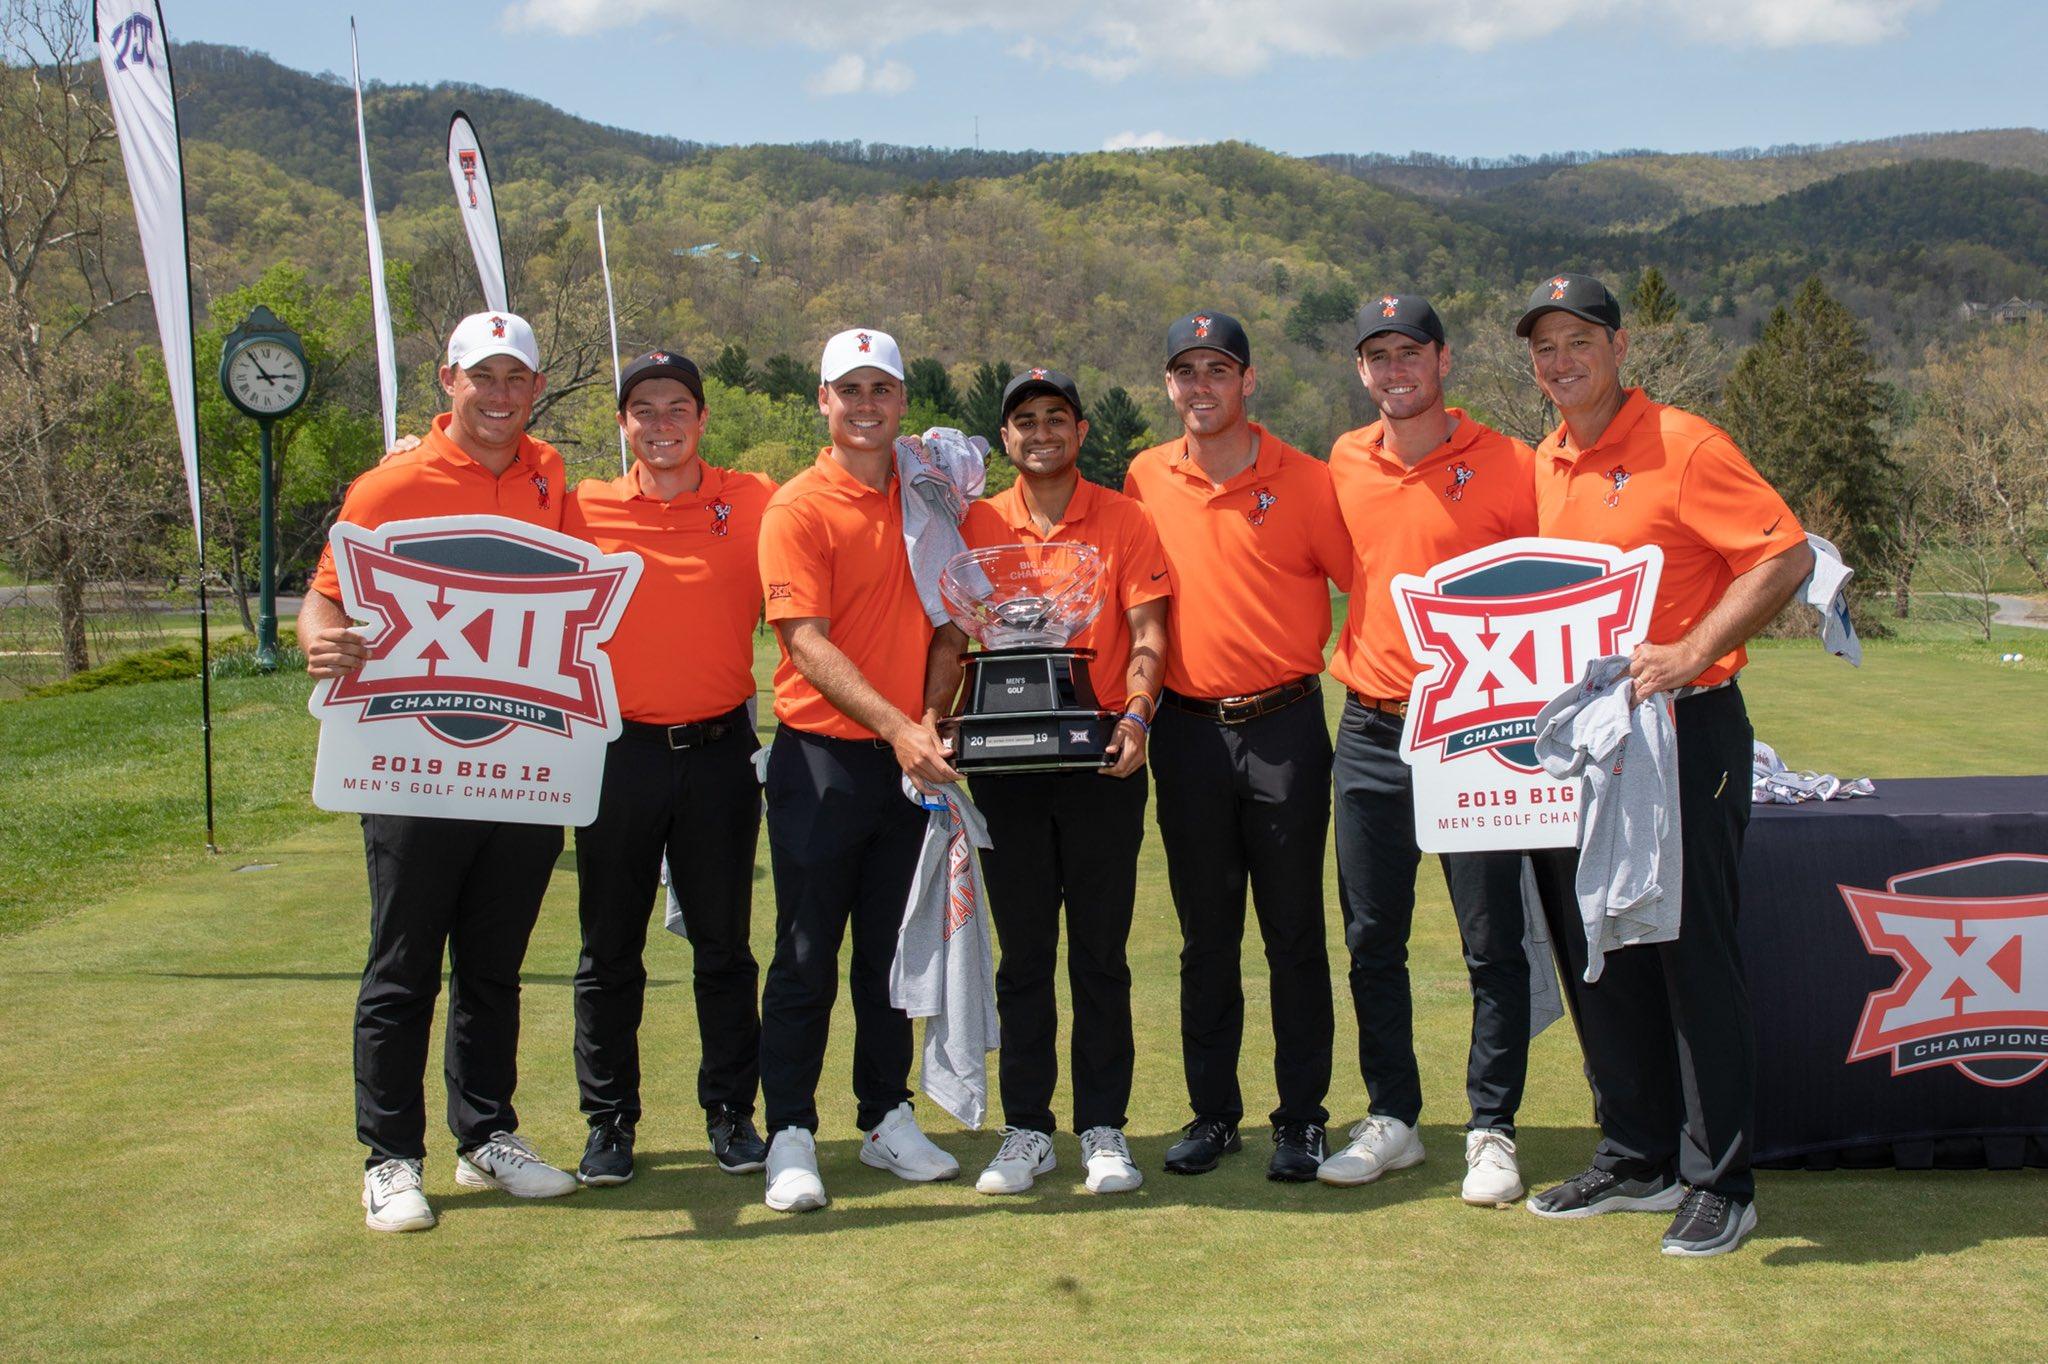 sfu mens golf team - HD2048×1364